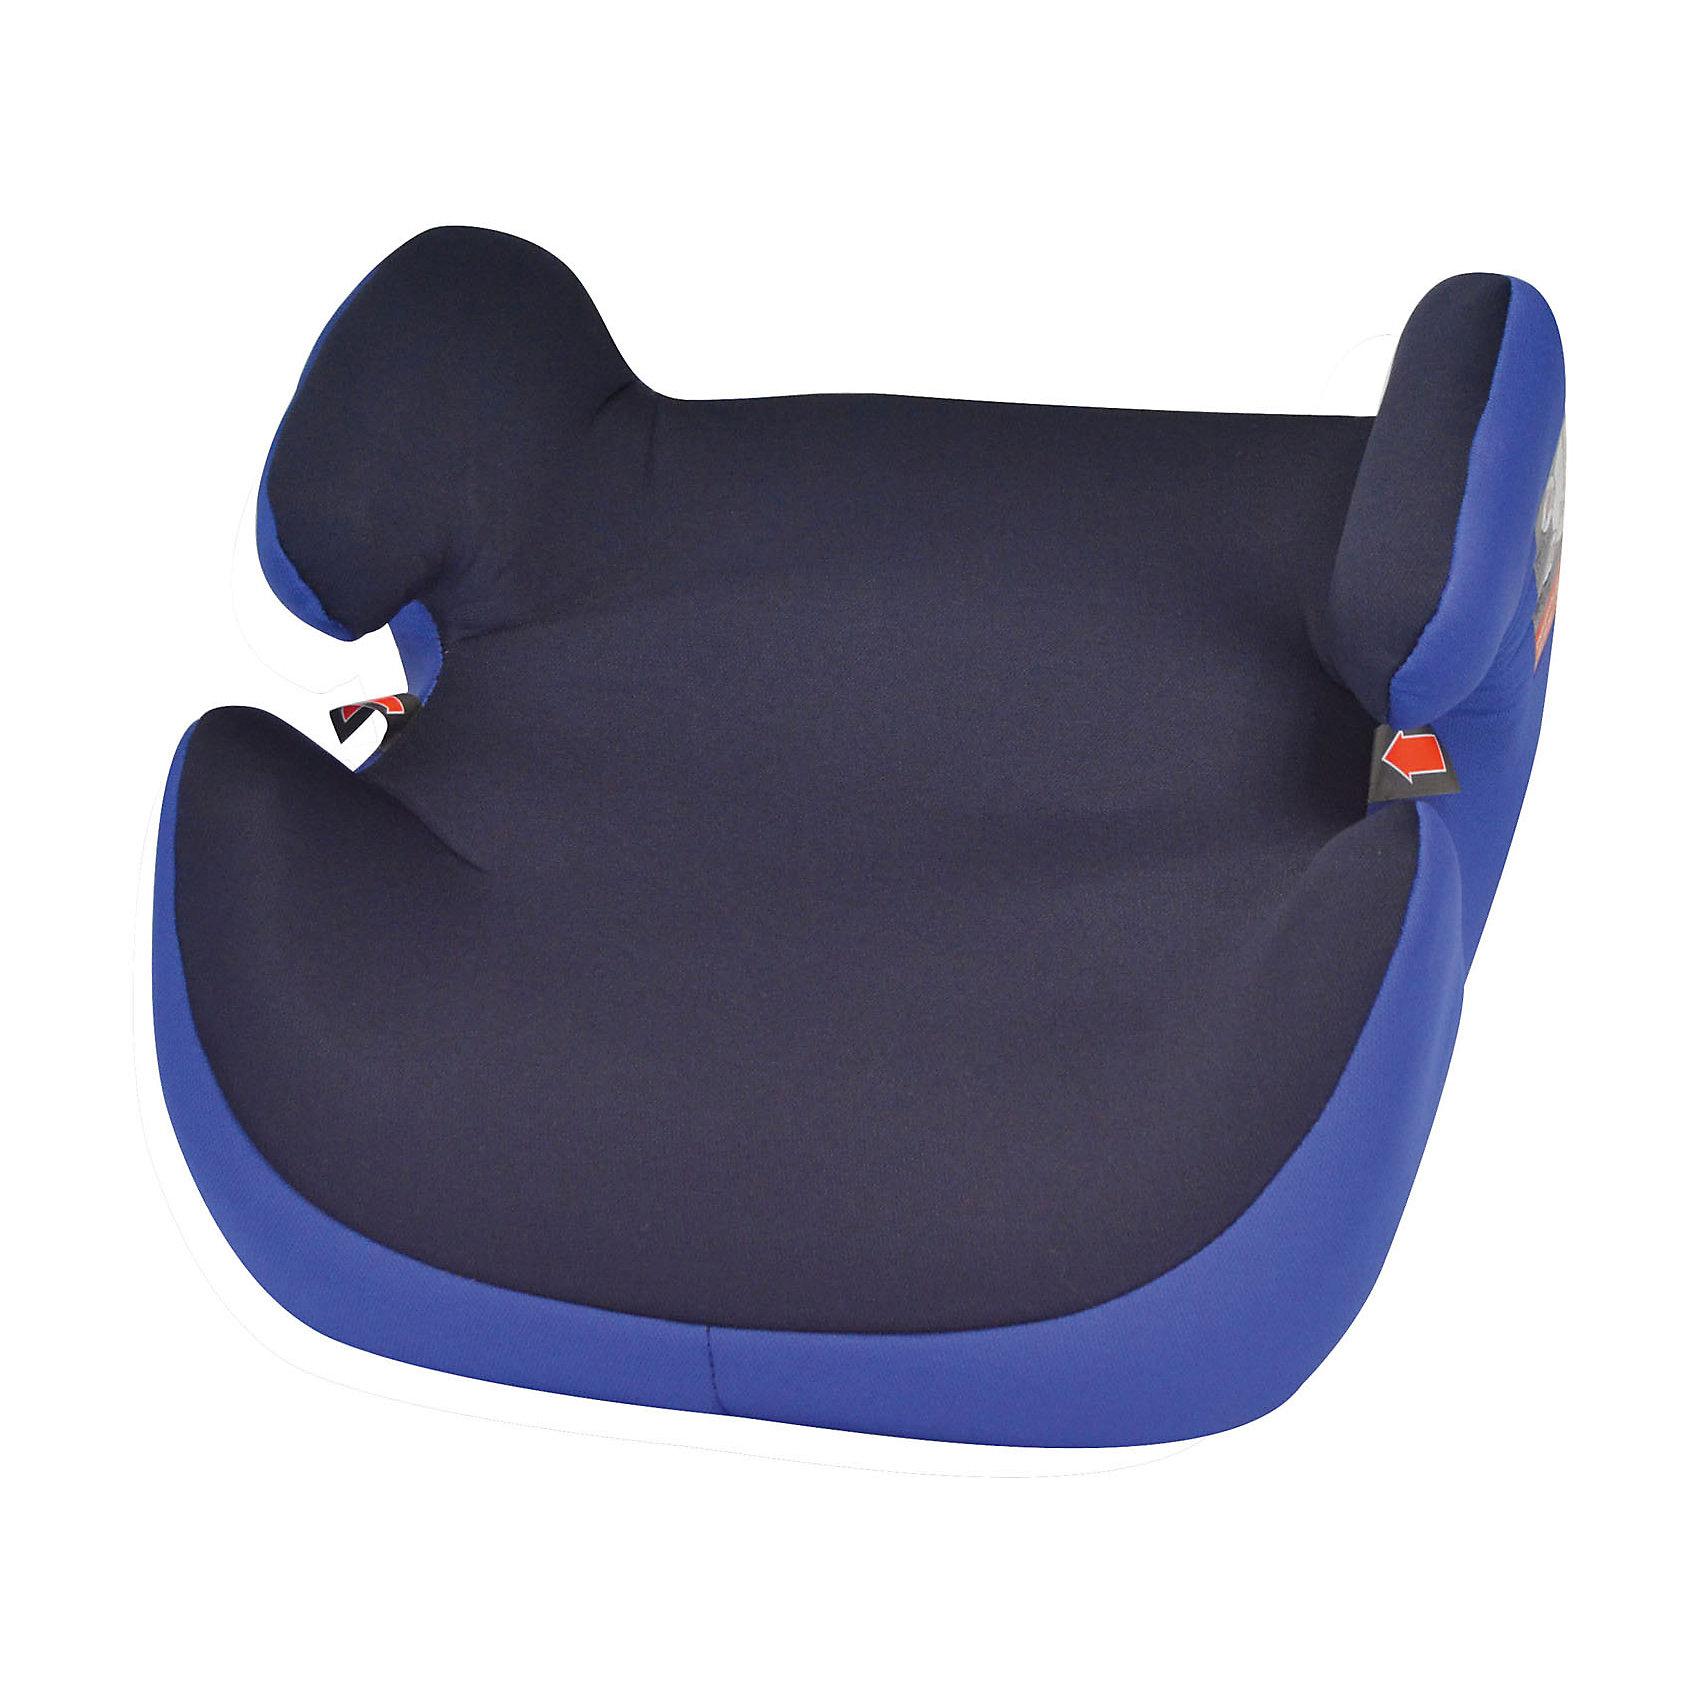 Автокресло-бустер Topo Comfort Eco, 15-36 кг., Nania, abyss